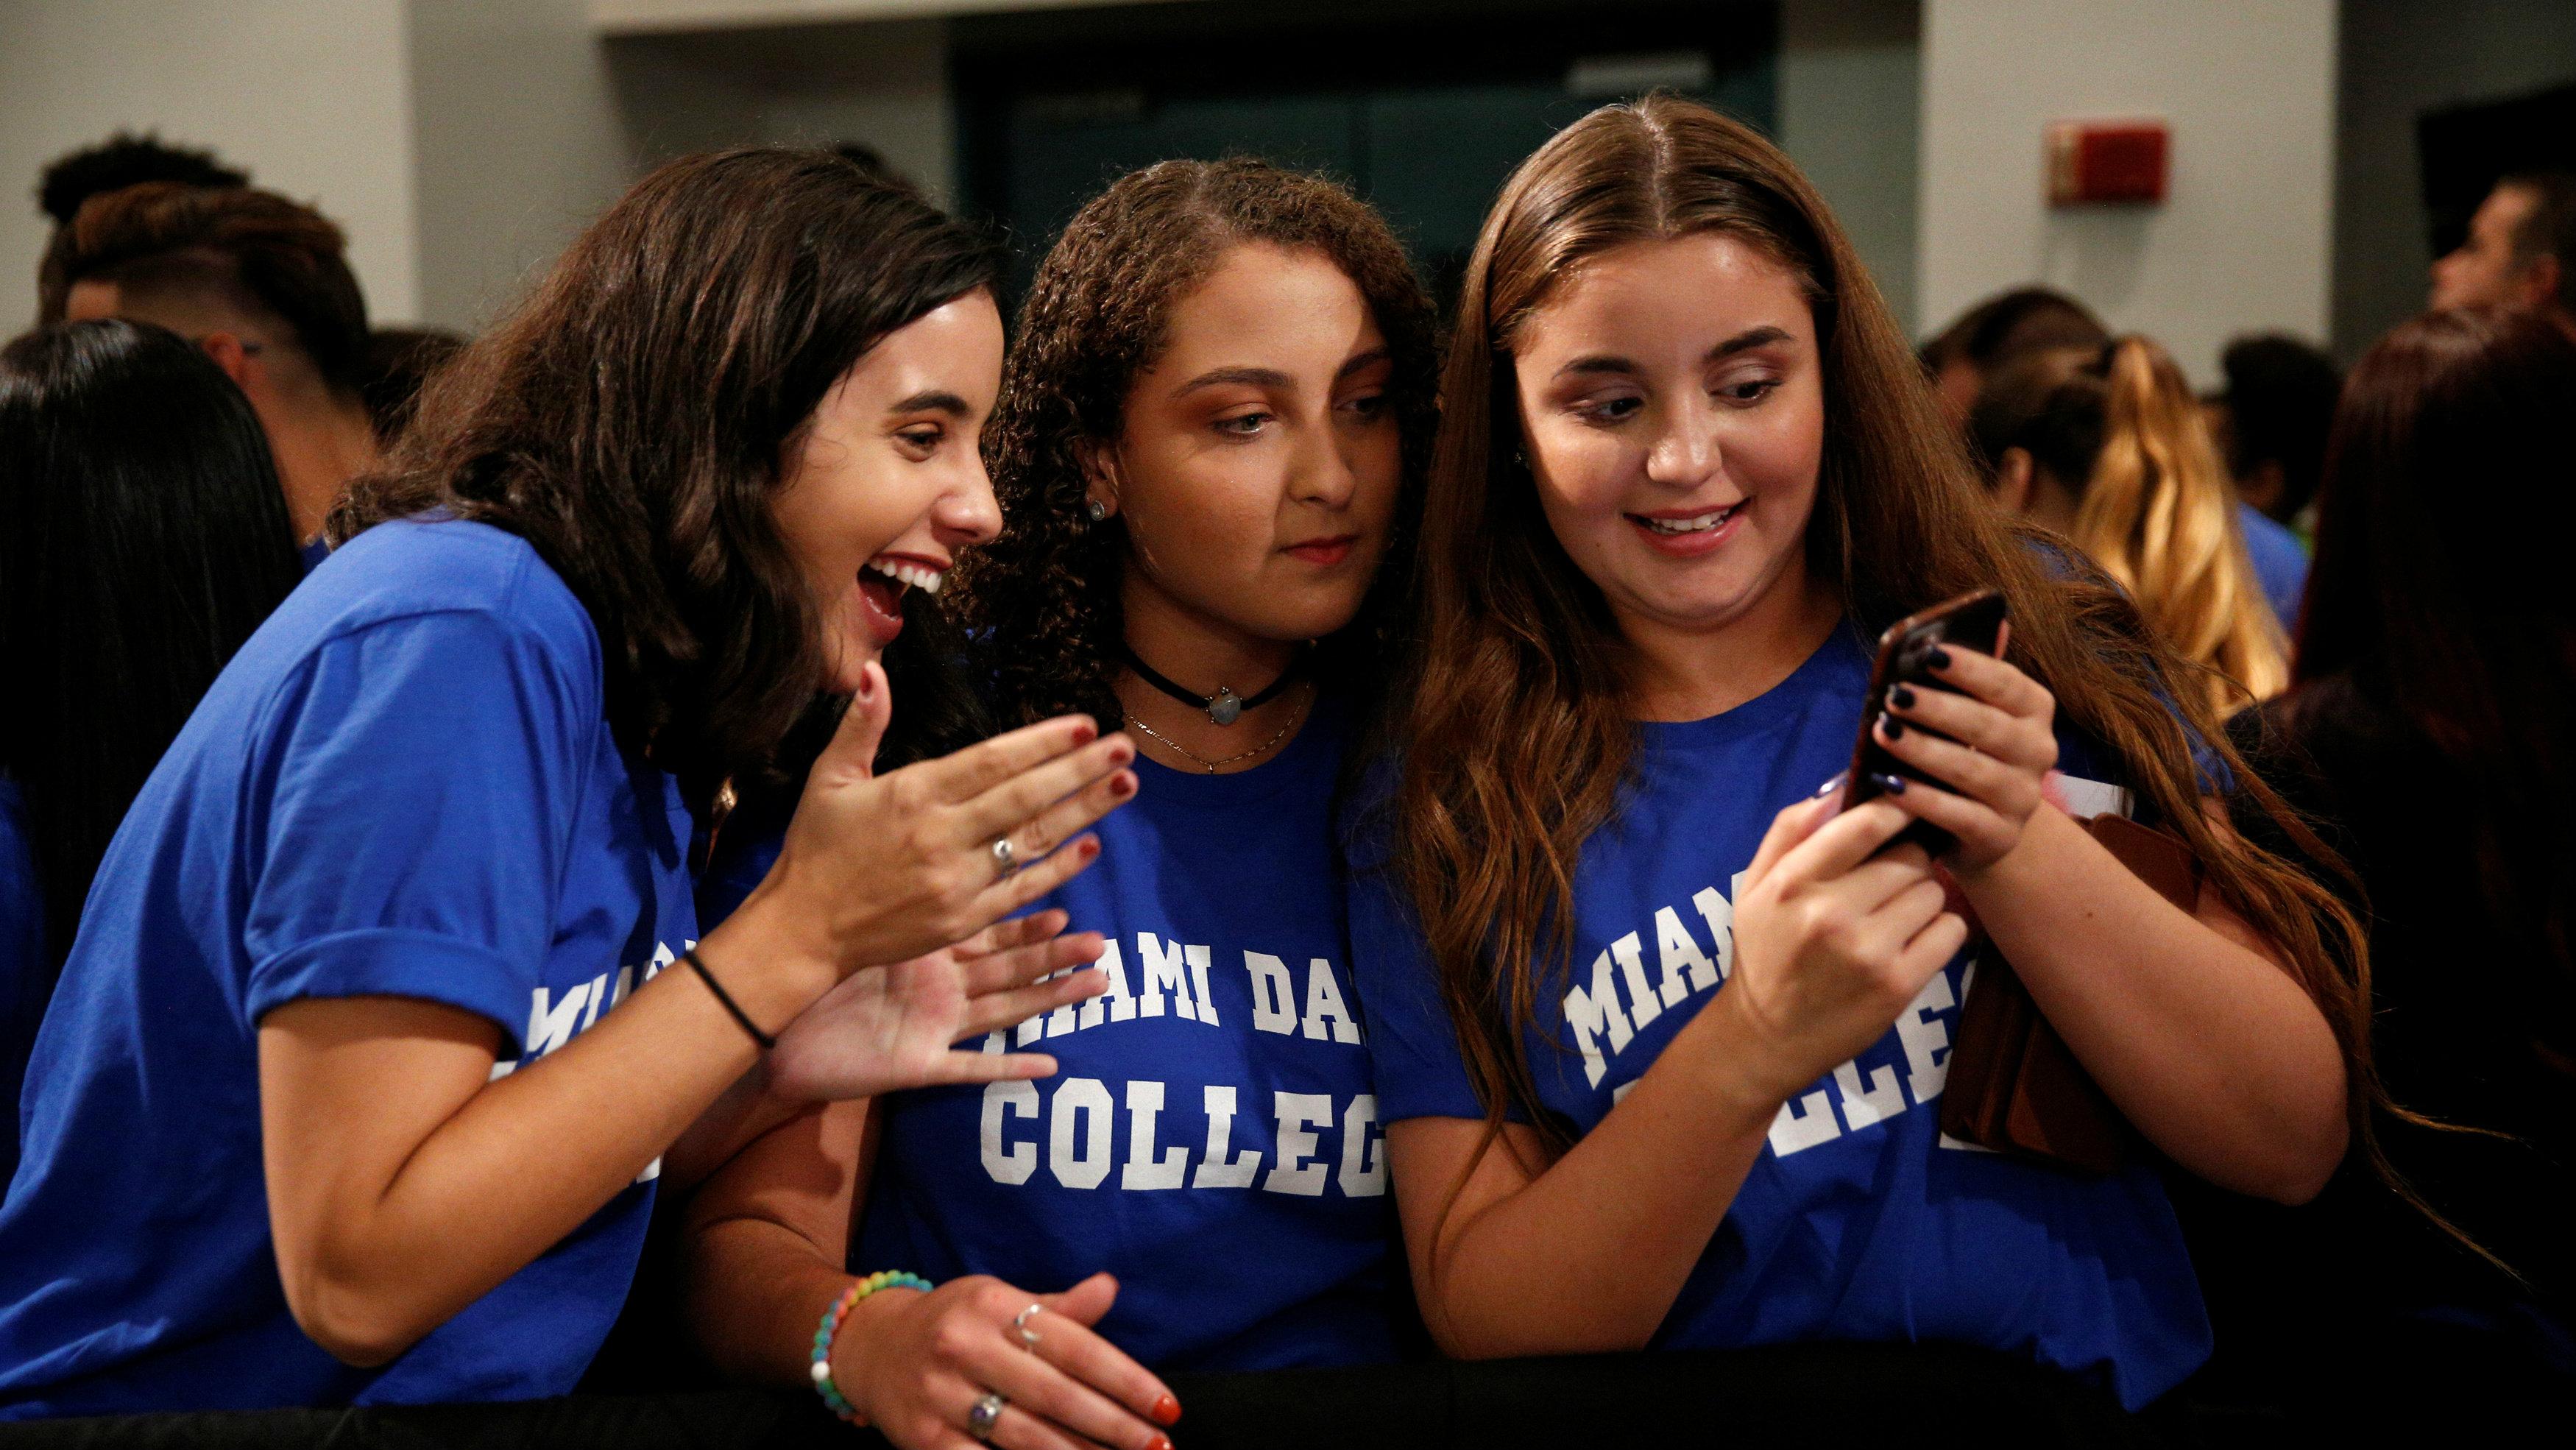 Do teens spend too much time on social media? — Quartz